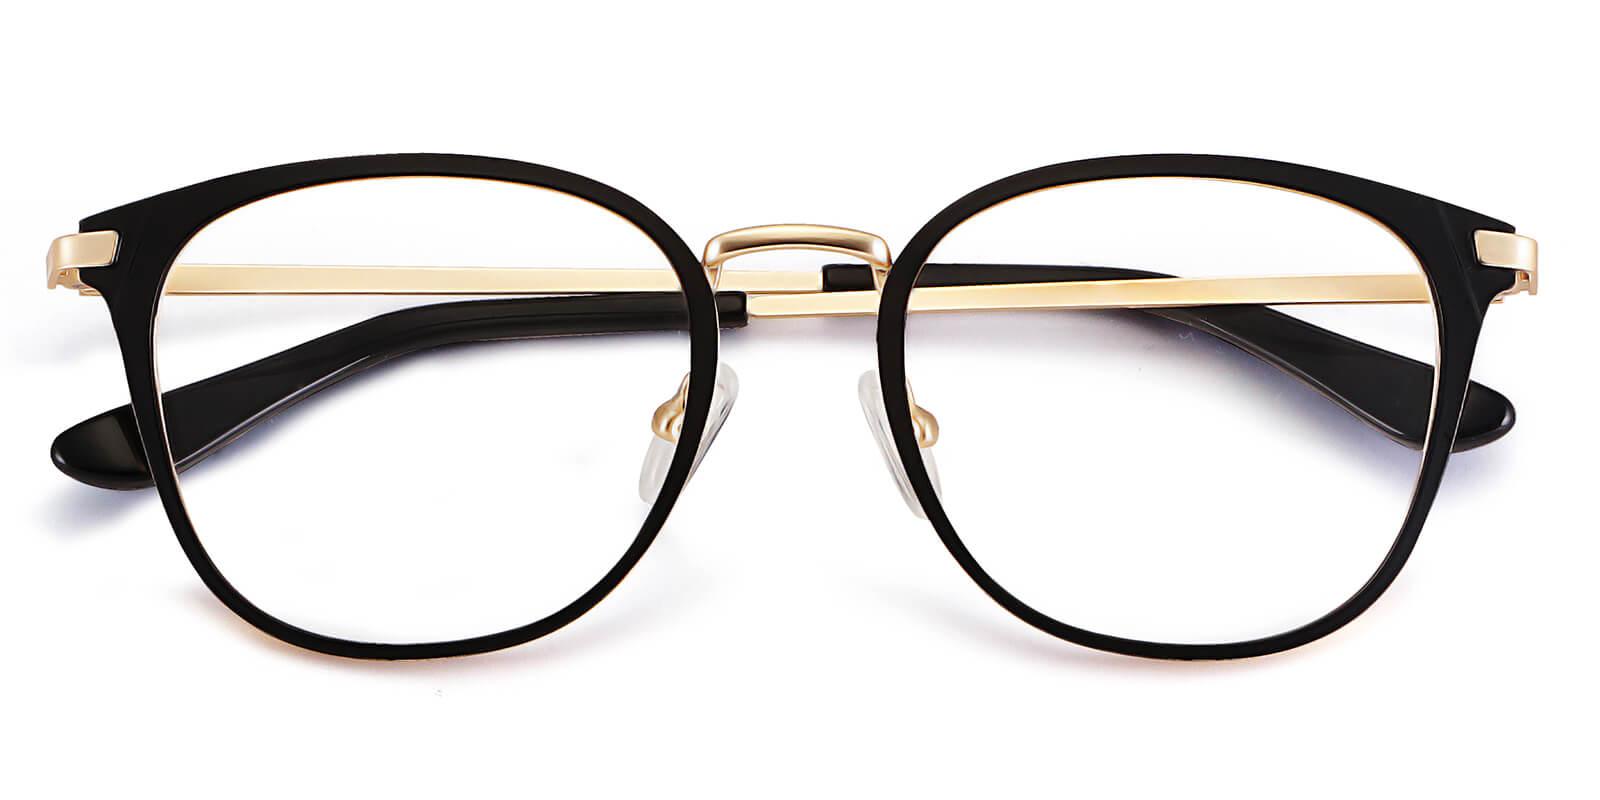 Mandy-Blue light blocking glasses - Overall cut steel